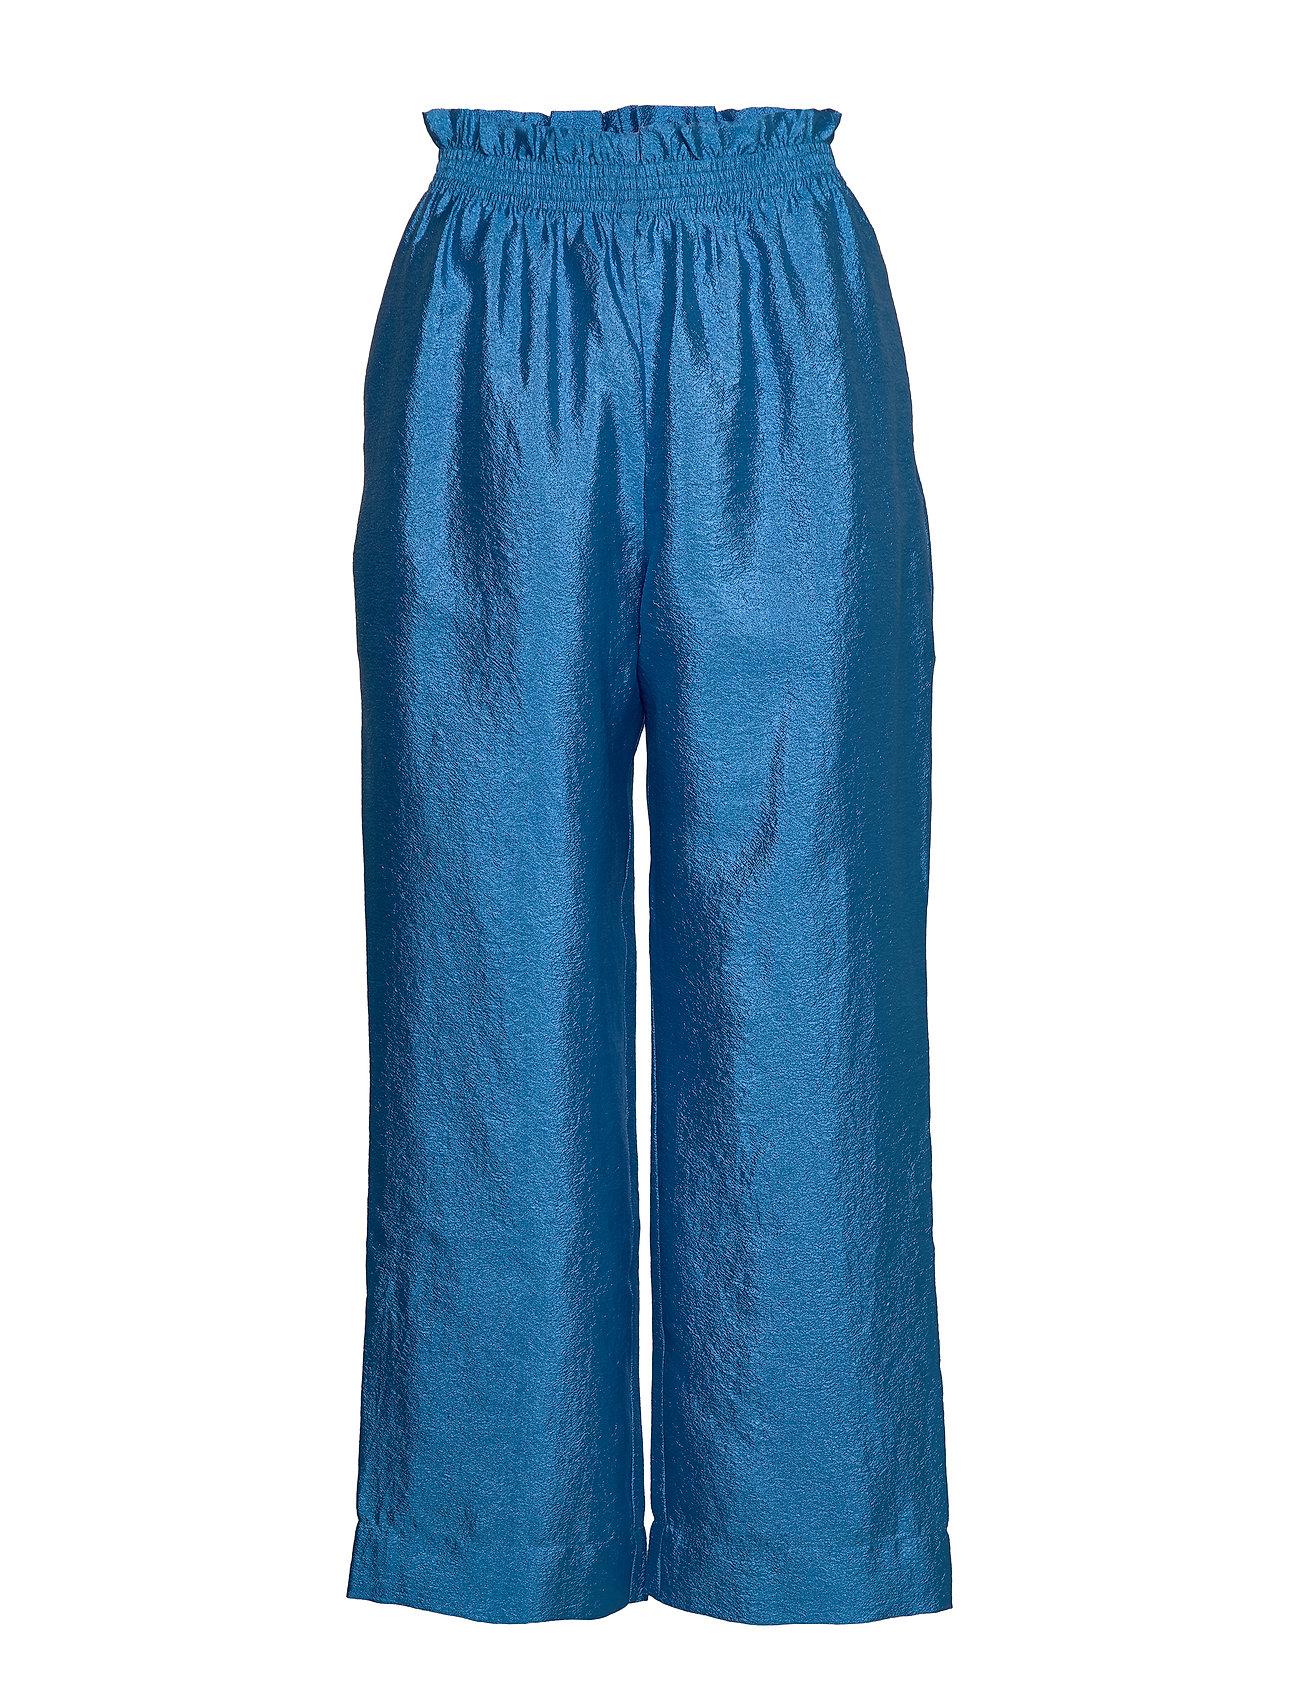 STINE GOYA Andre, 784 Textured Poly - BLUE